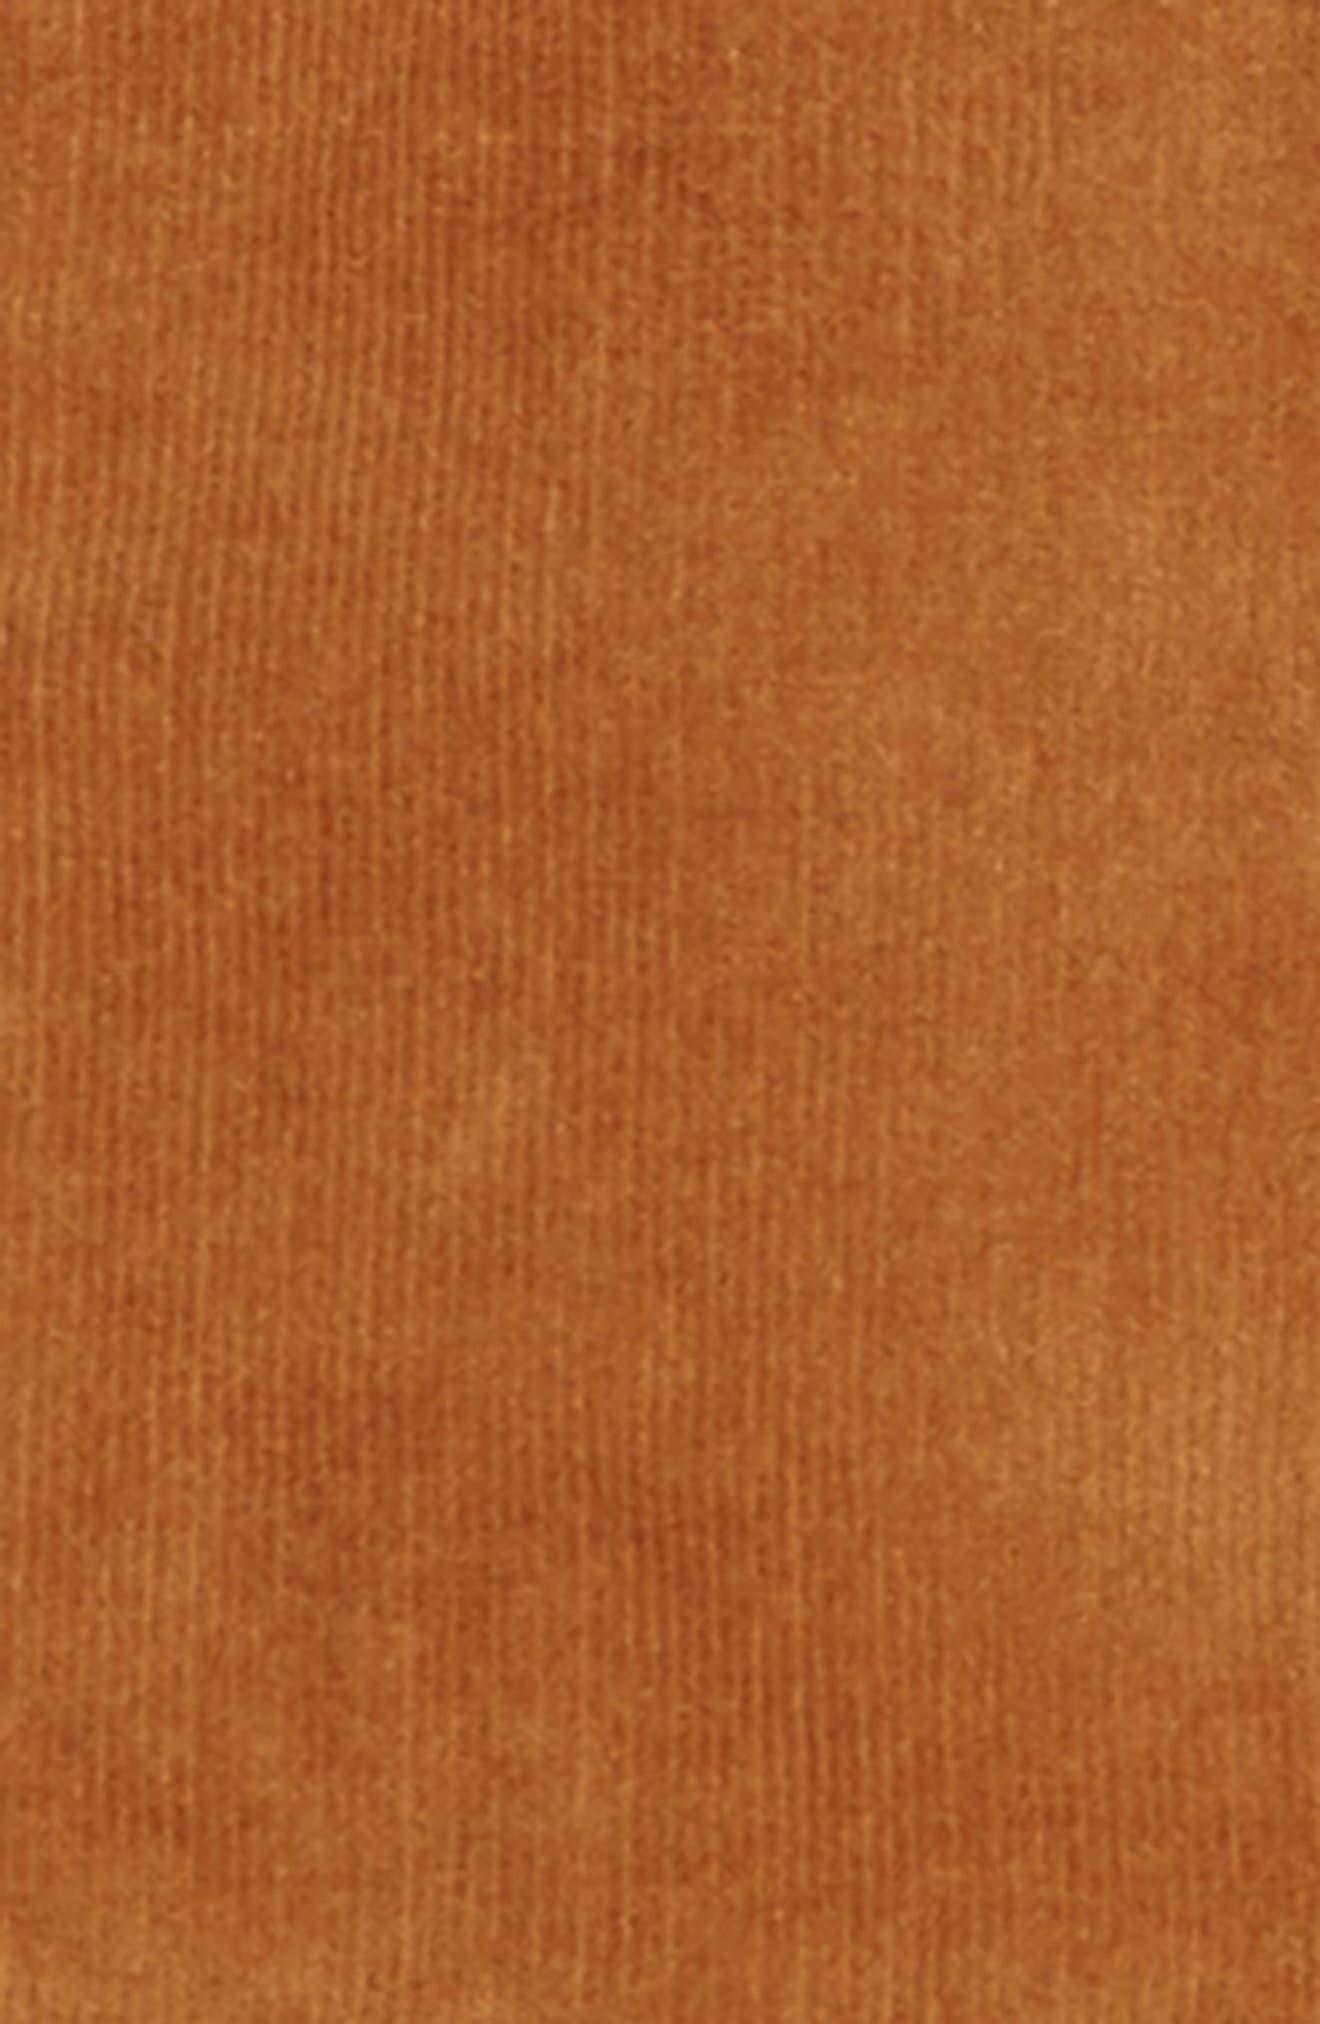 Reversible Corduroy/Plaid Hooded Jacket,                             Alternate thumbnail 3, color,                             TAN DALE